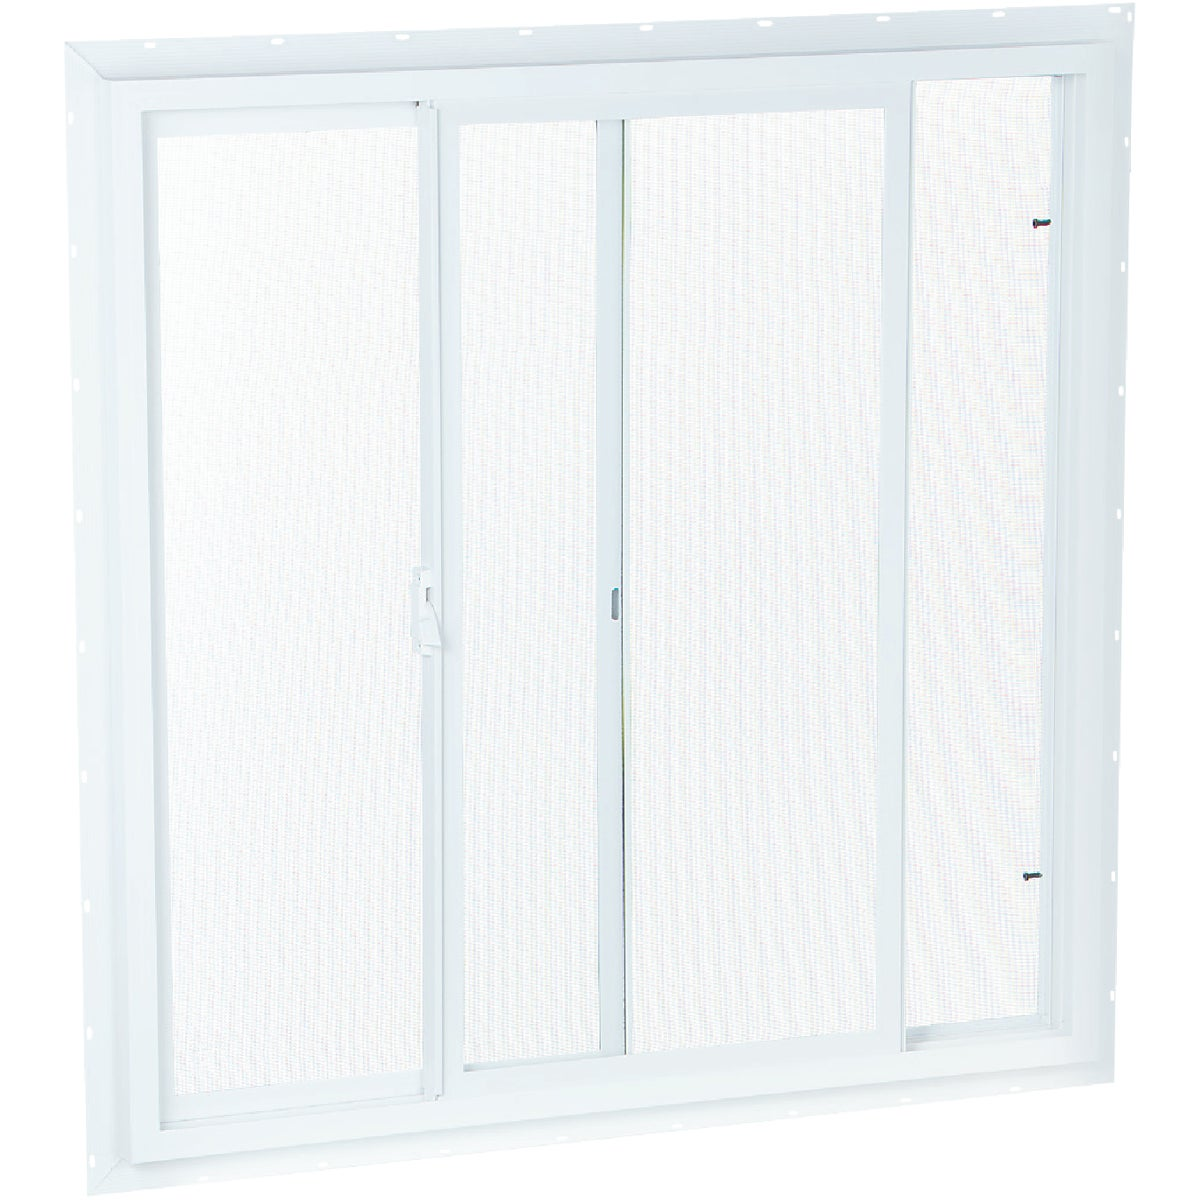 WHT SLDR WINDOW W/SCREEN - 2020 by Duo Corp